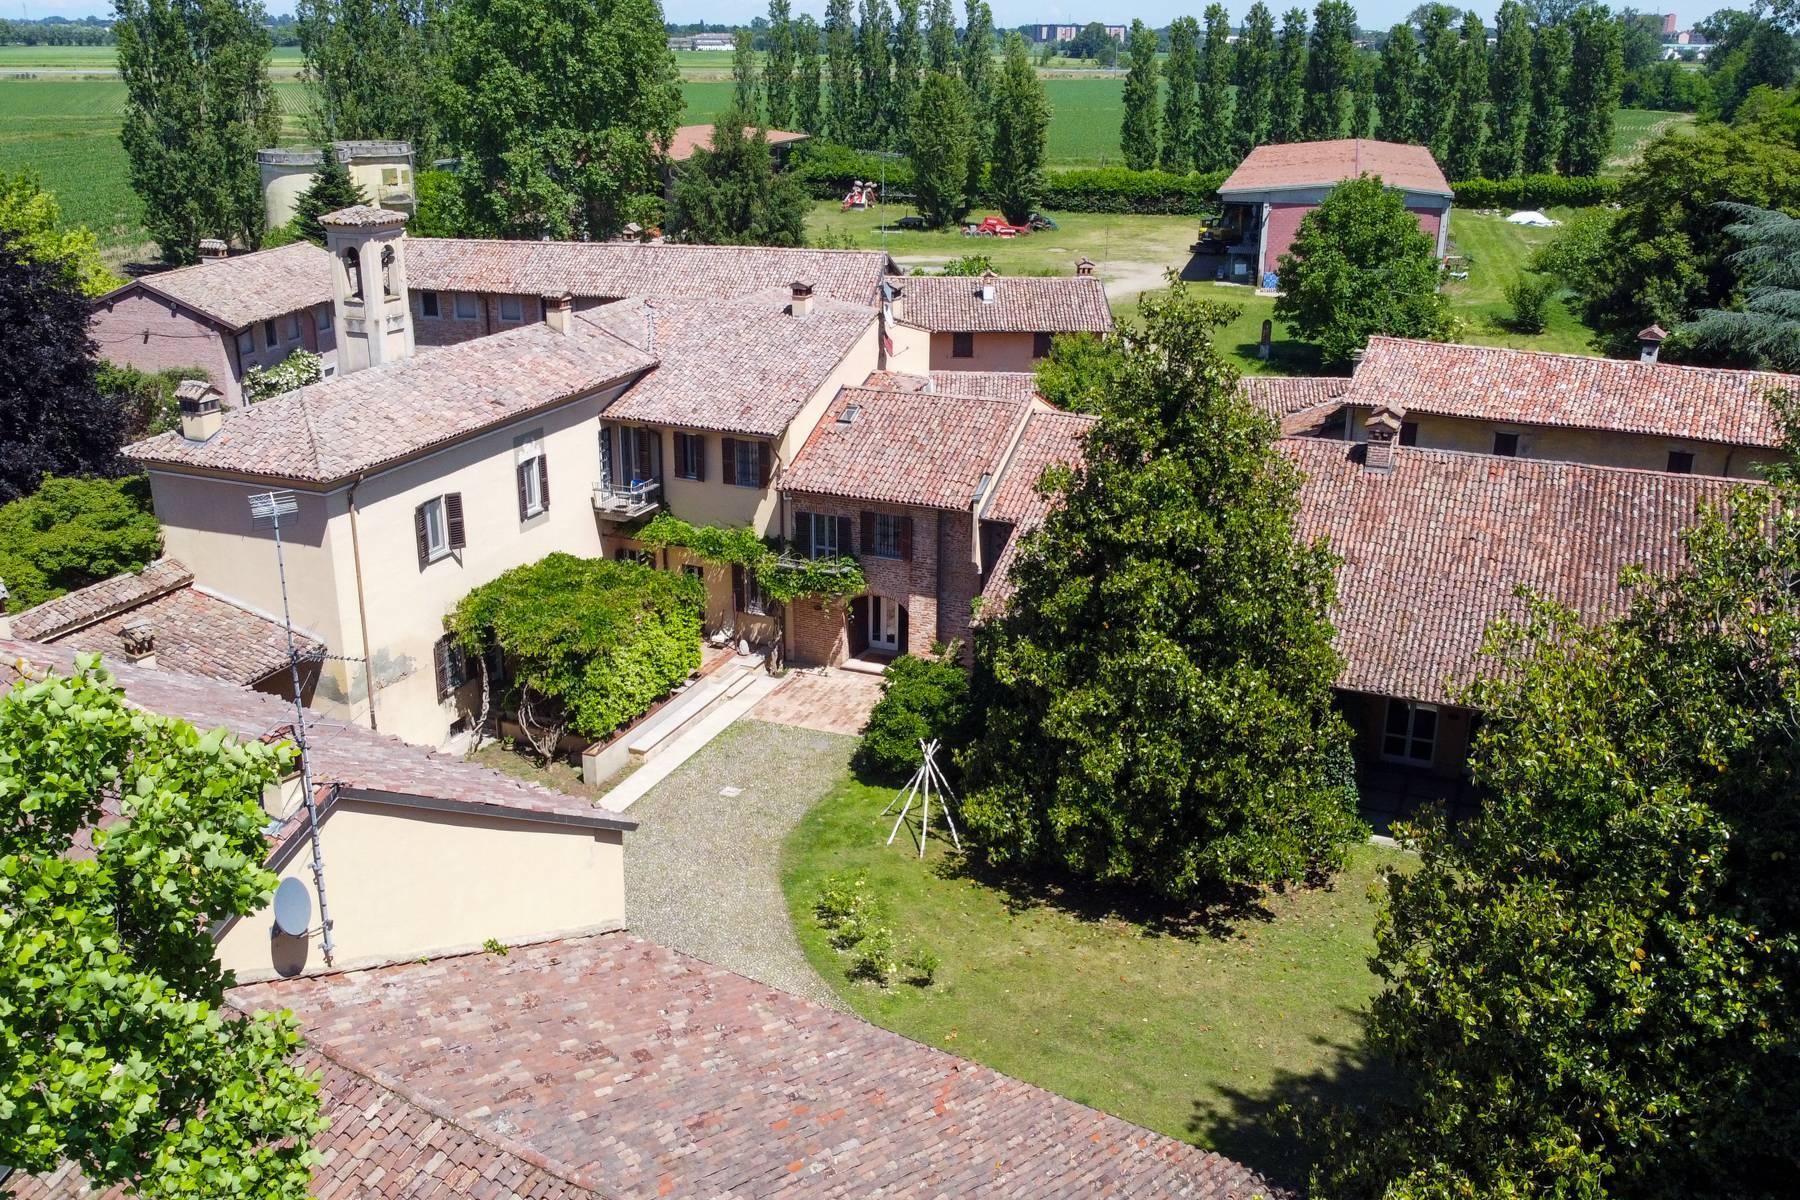 Magnifica proprietà immersa nel verde a Pavia - 33